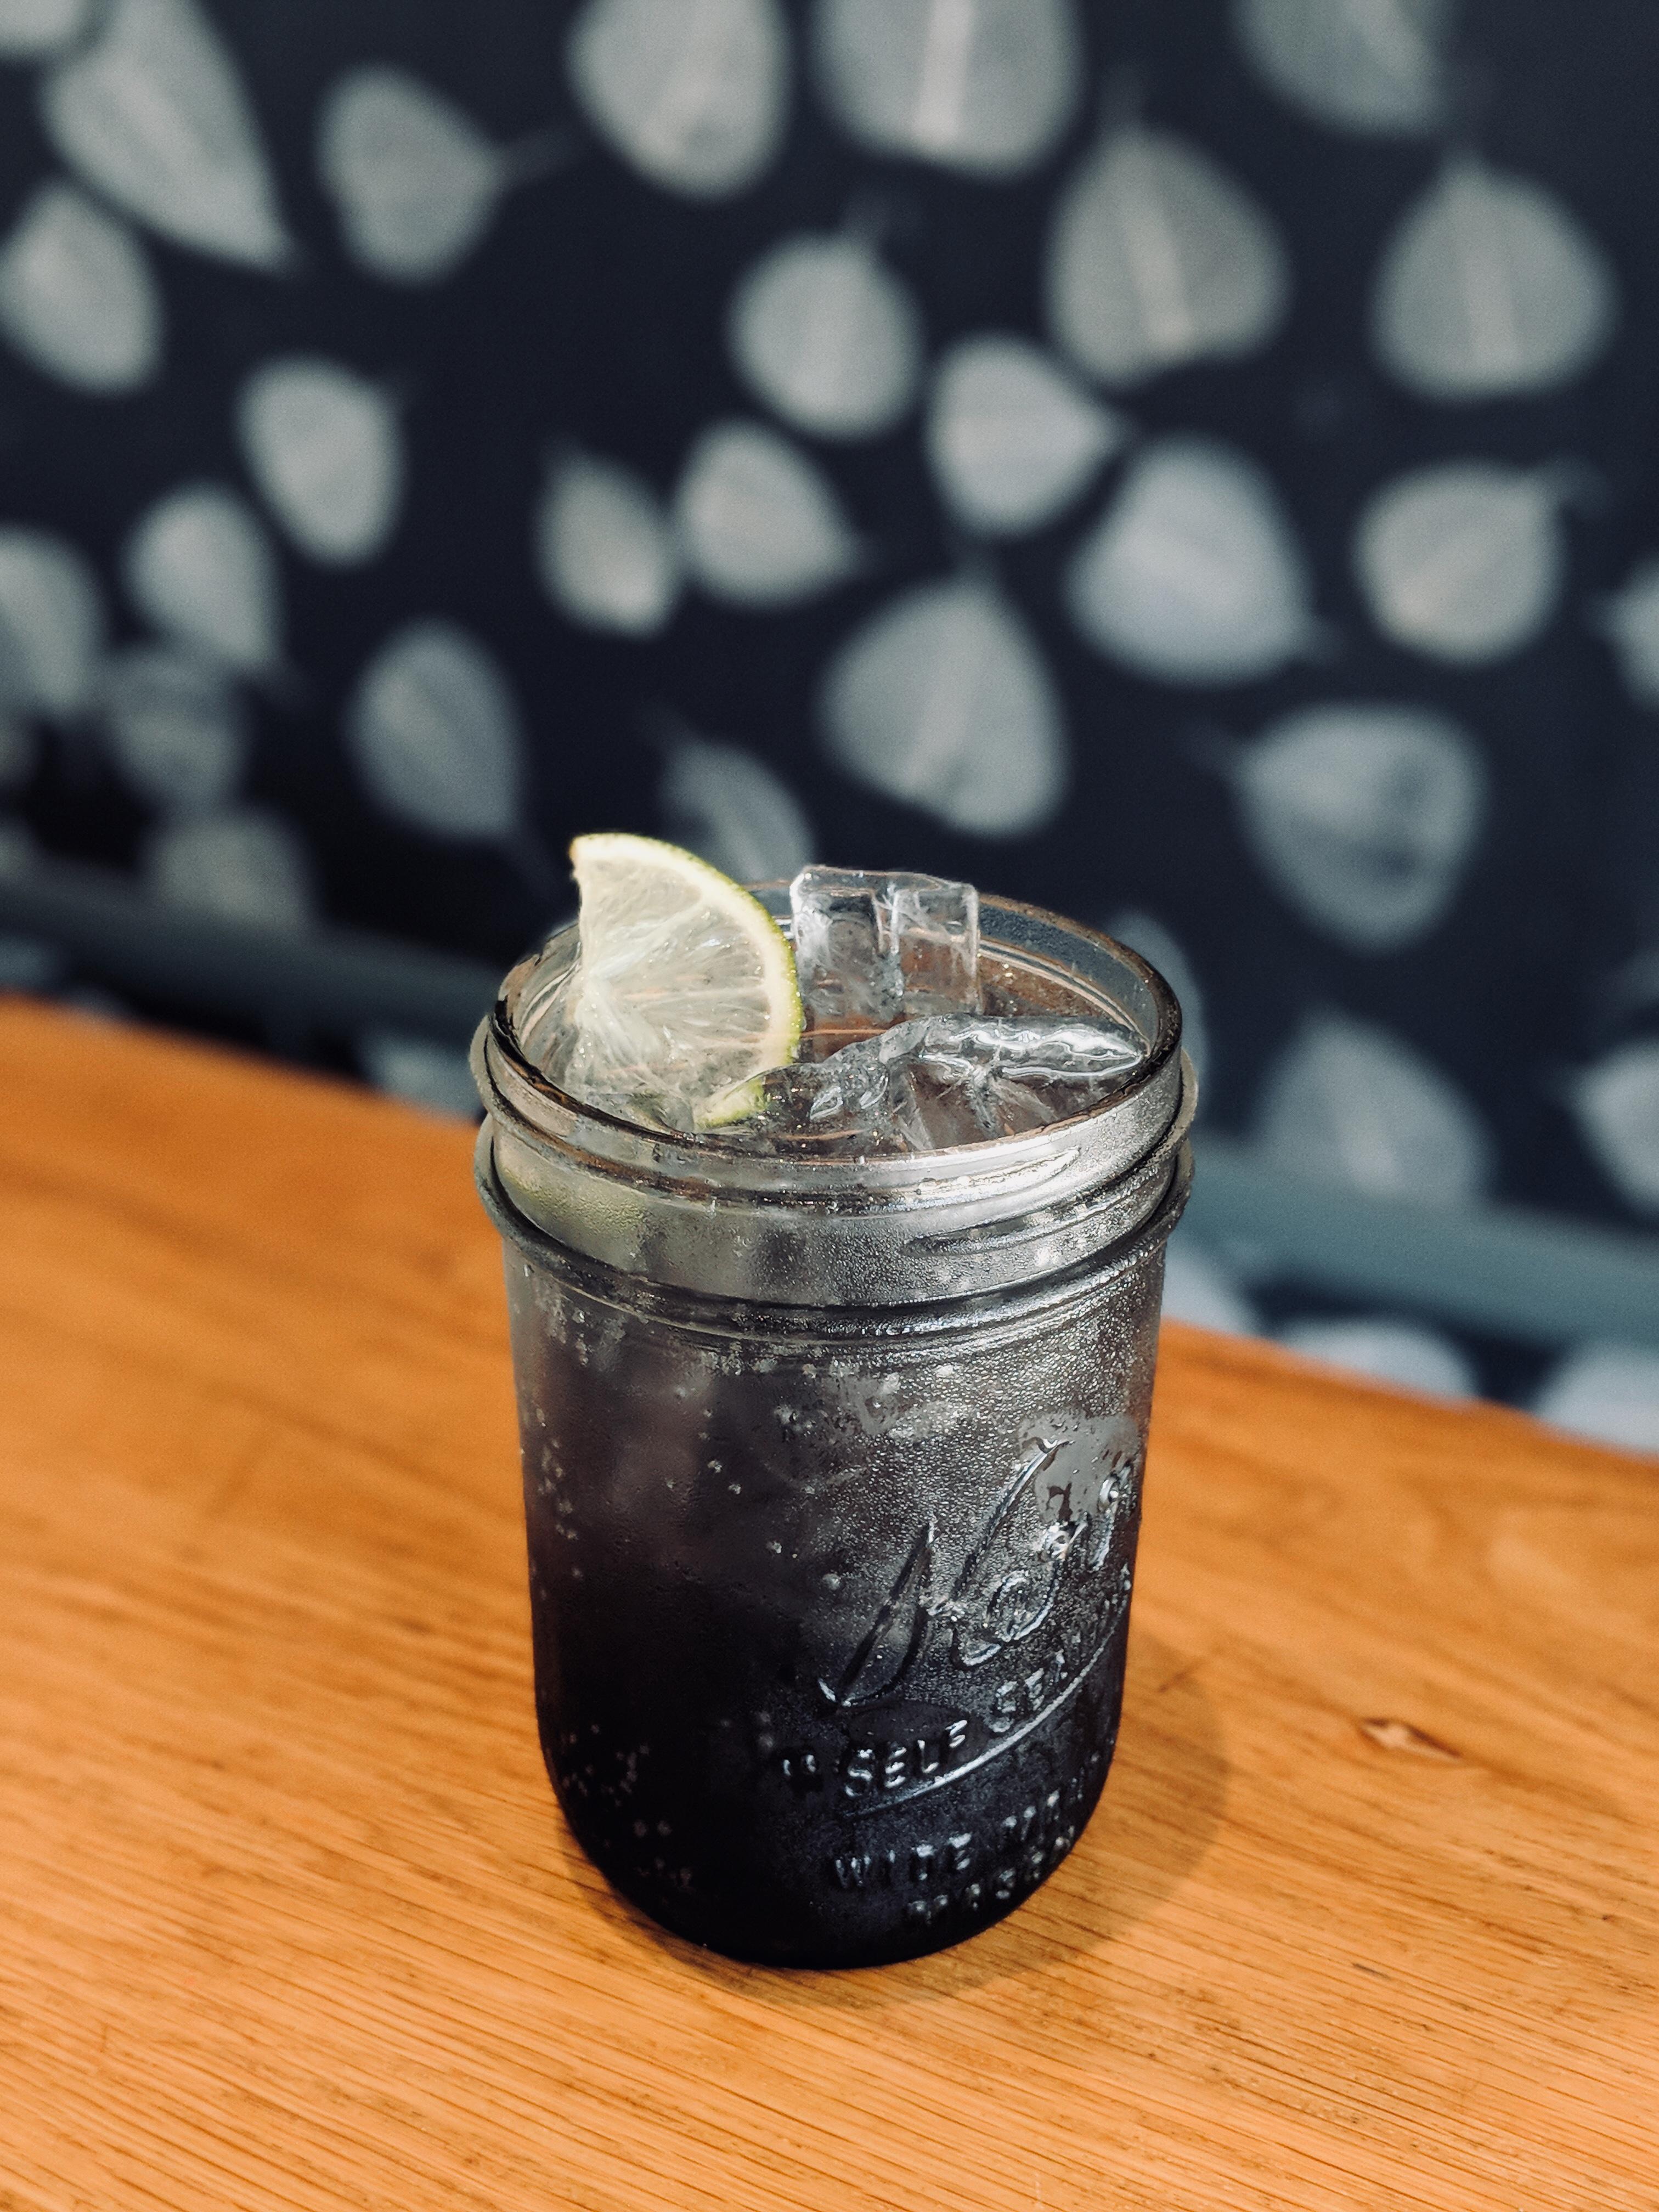 Black Limeade